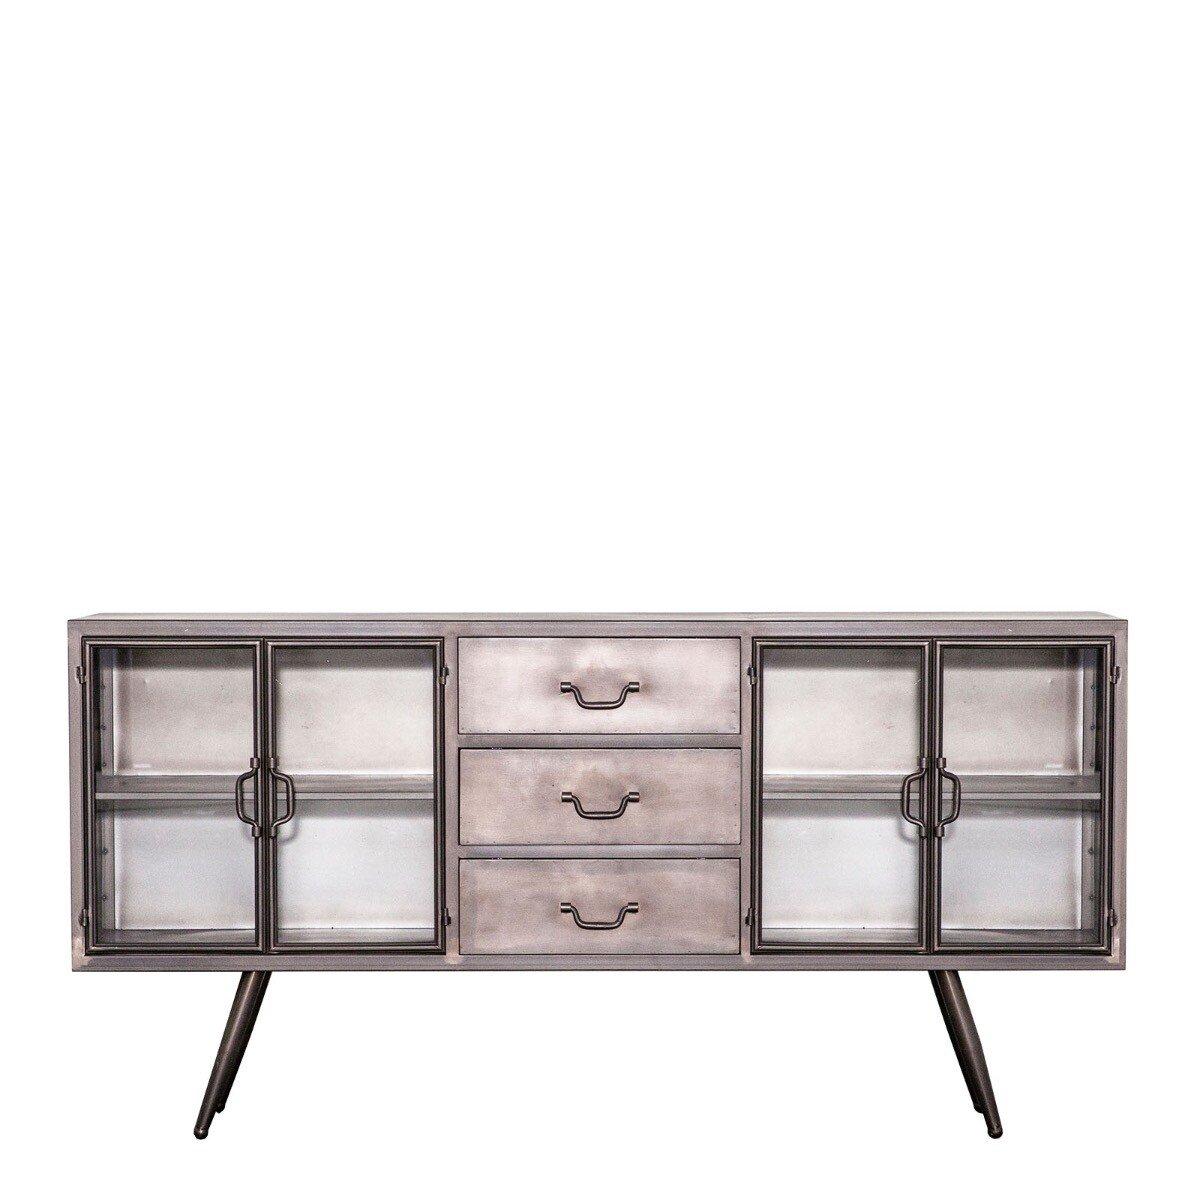 By Boo dressoir Ventana Collection 75 x 150 x 37